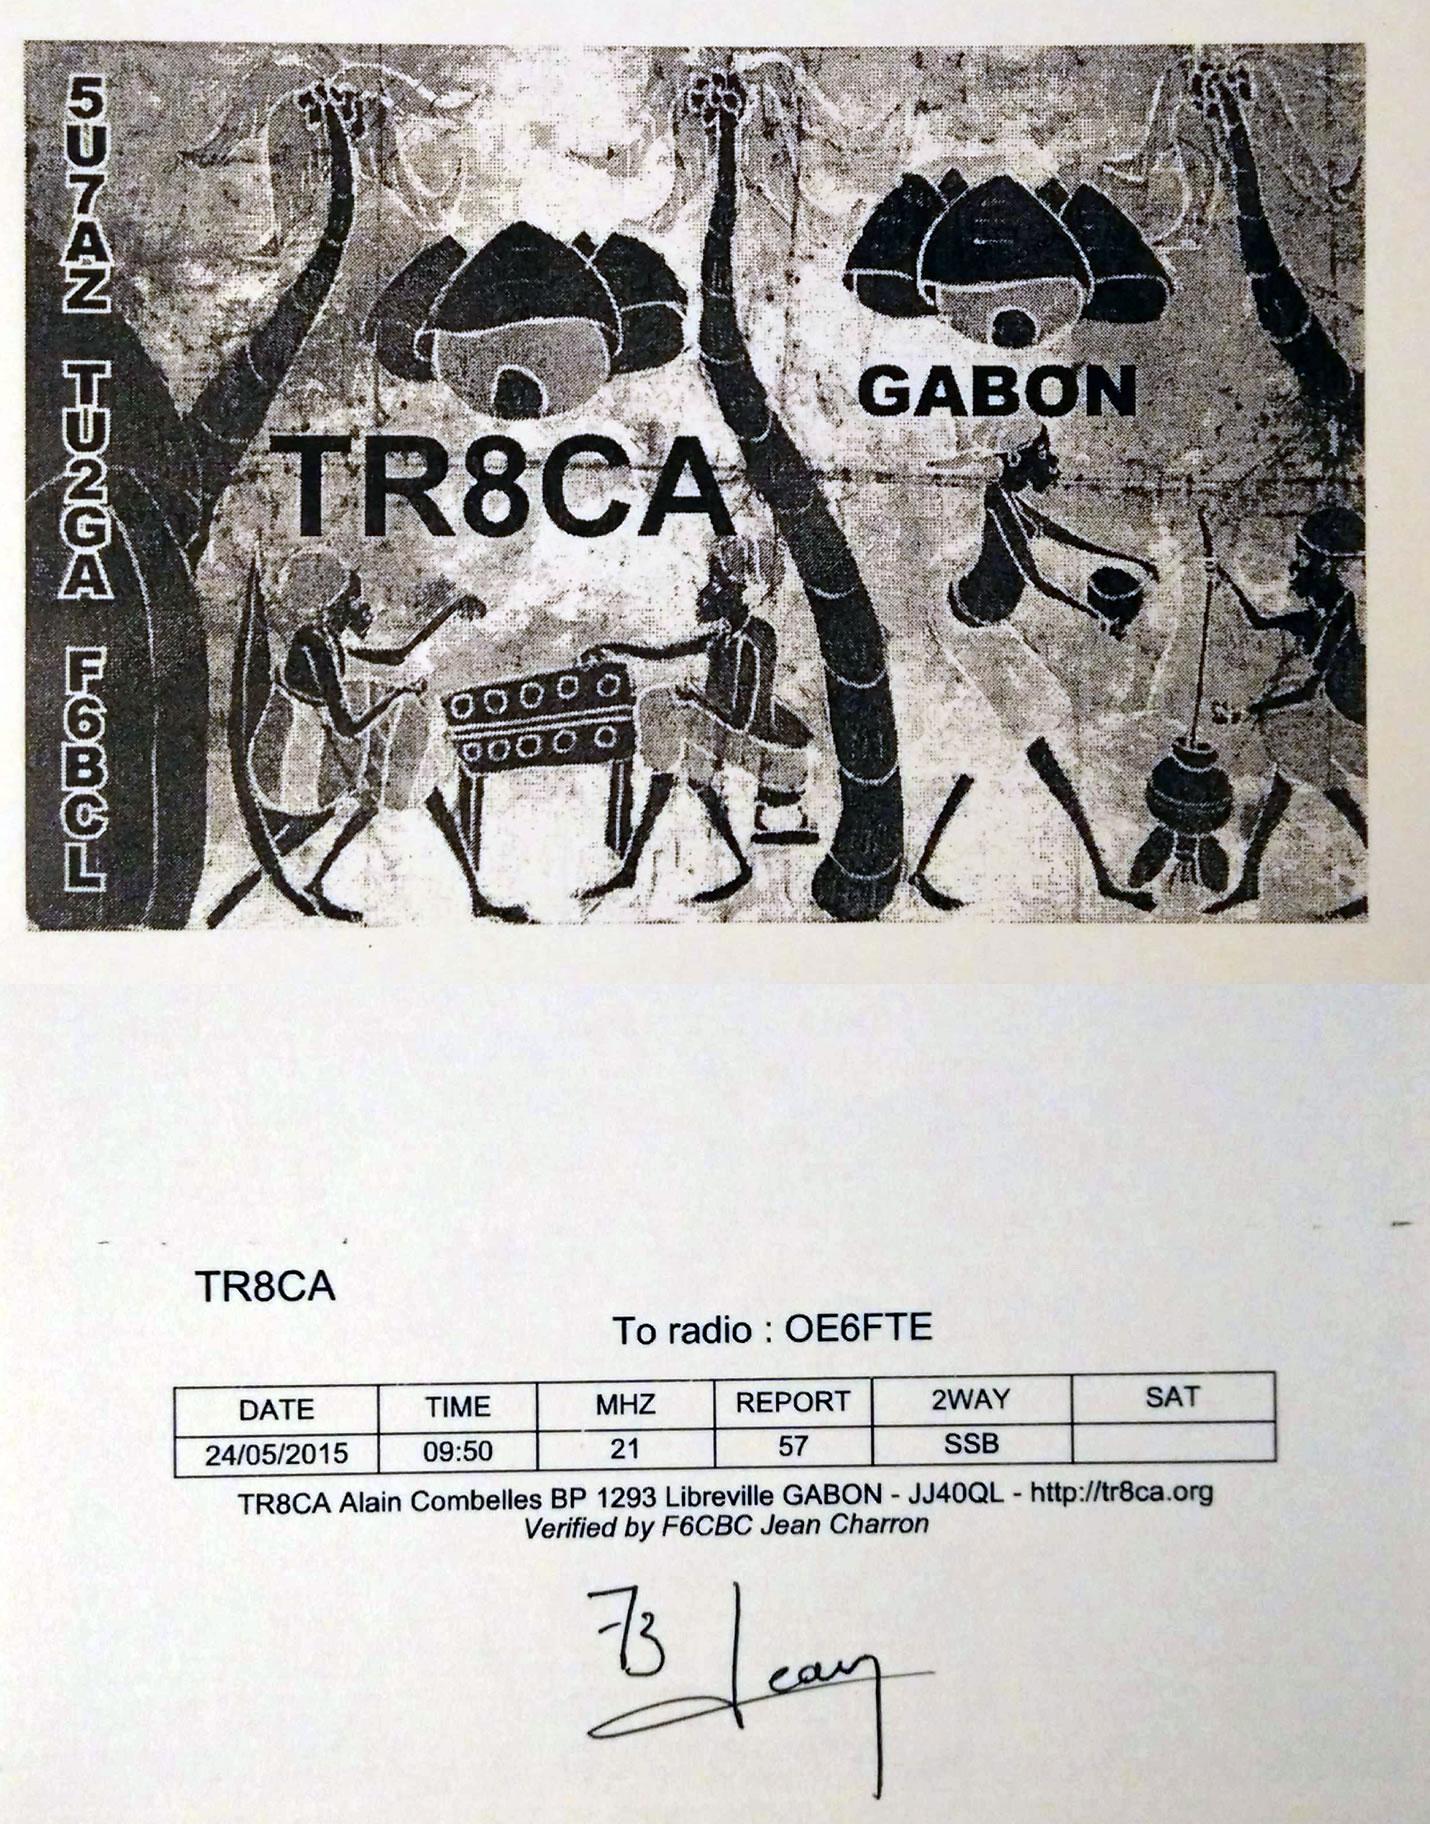 TR8CA